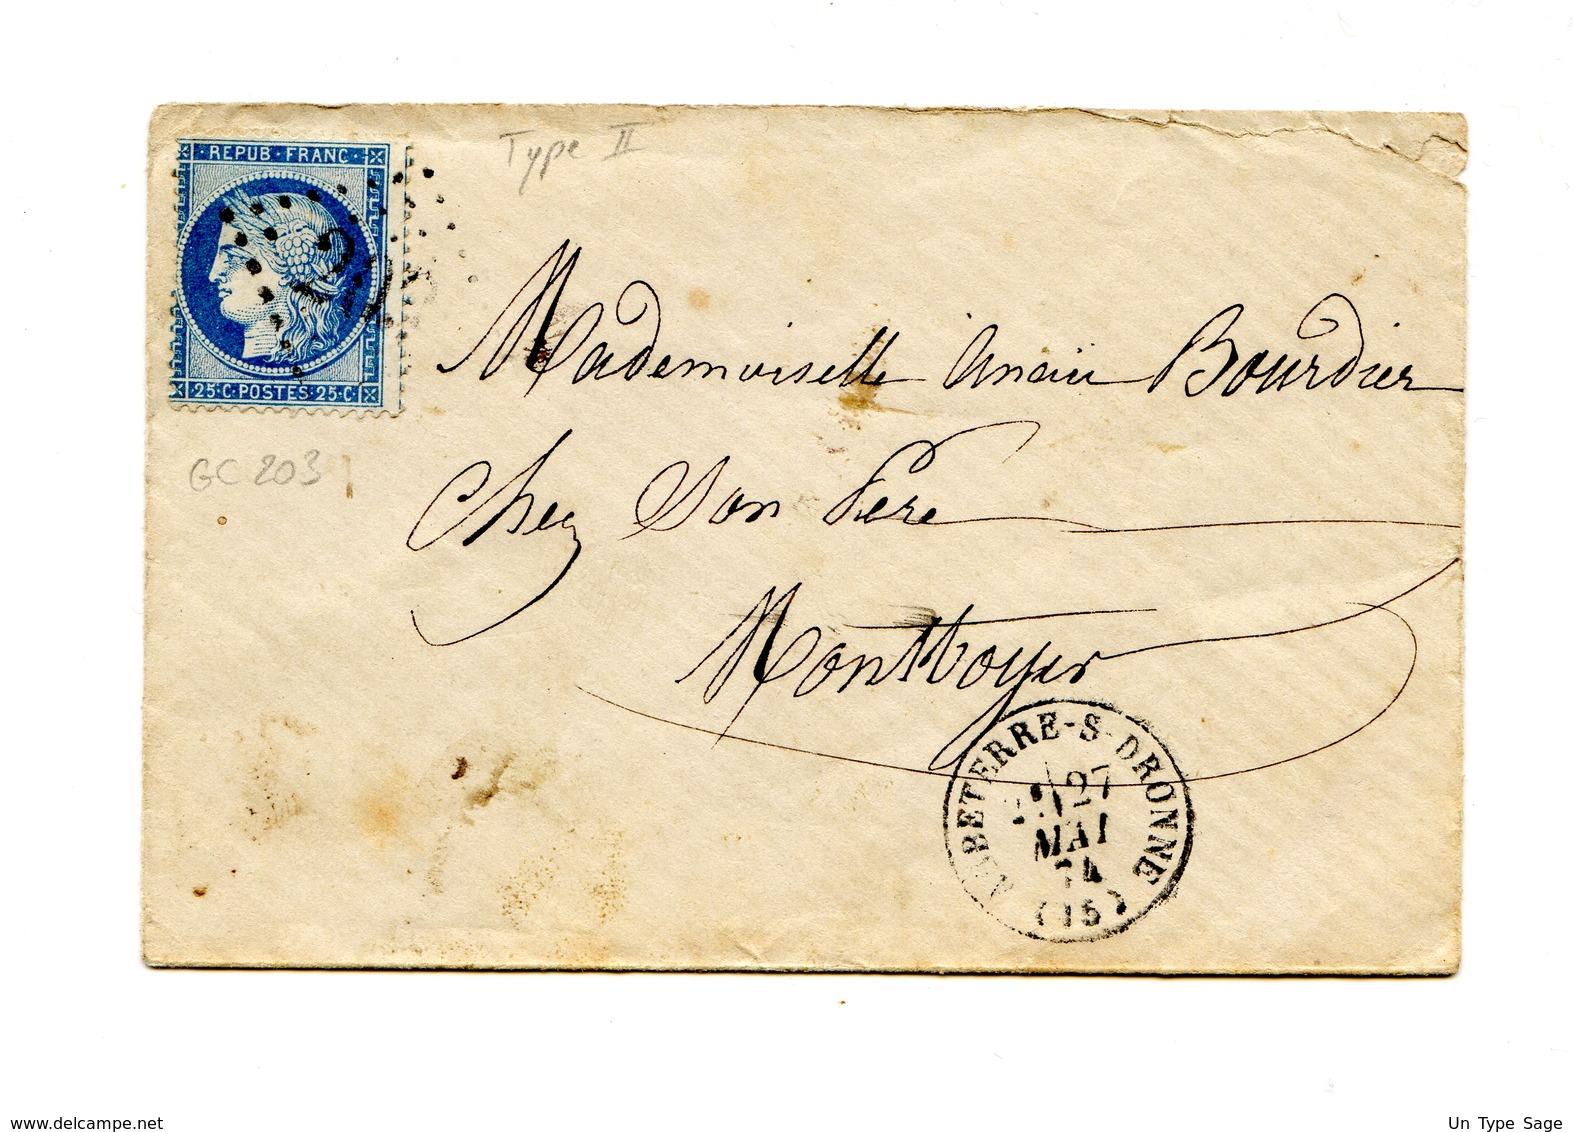 France - Cérès N°60 II - Lettre - GC 203 - 1874 - 2 Scans - (B2140) - 1871-1875 Ceres